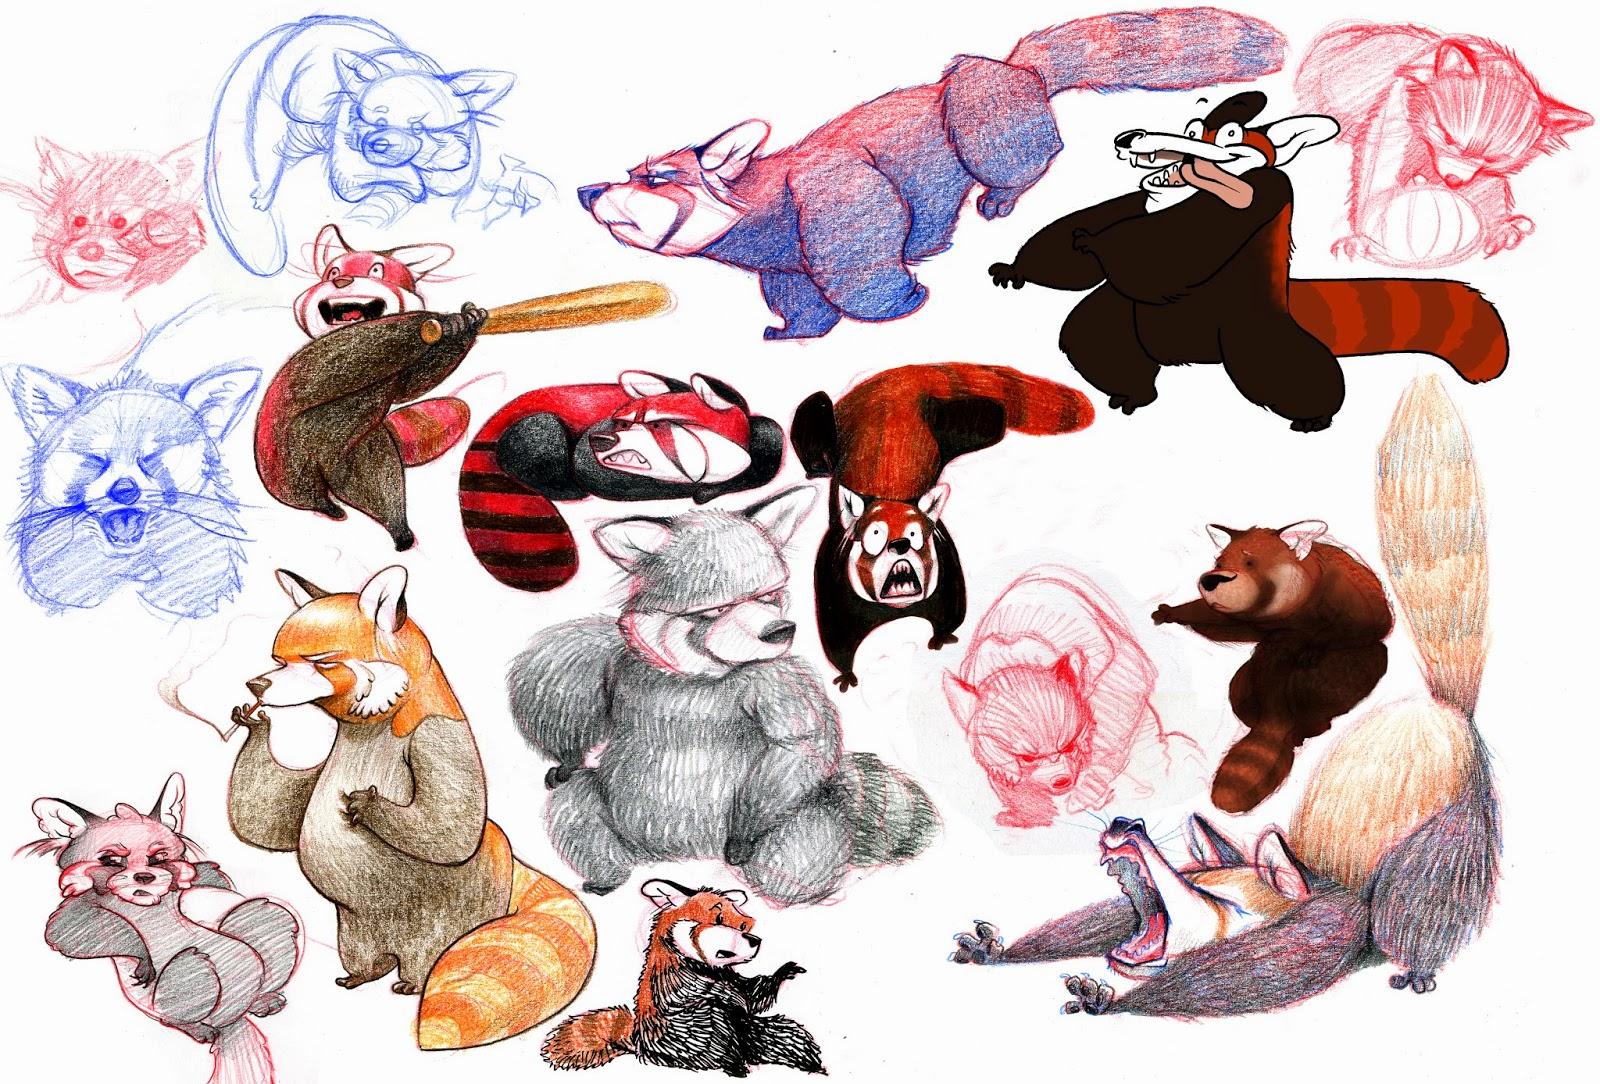 Stradacoast: Red Panda Party